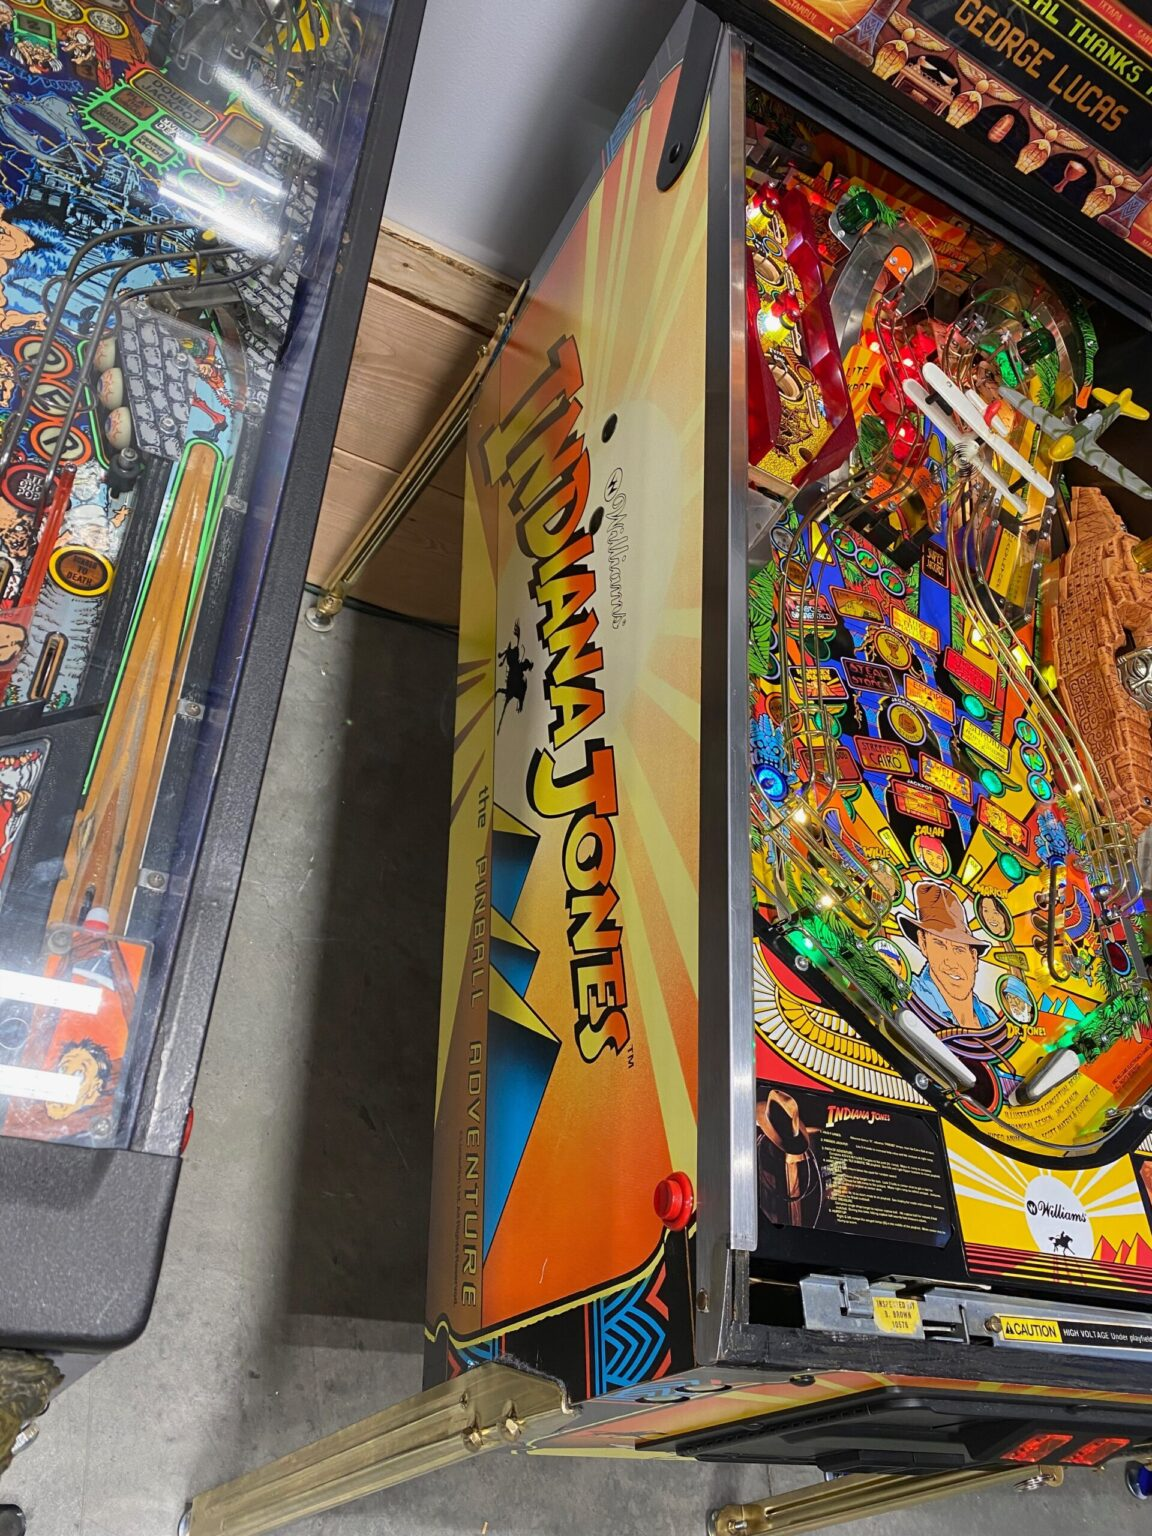 Flipper - Flipperautomaten - Pinball - Kaufen: Indiana